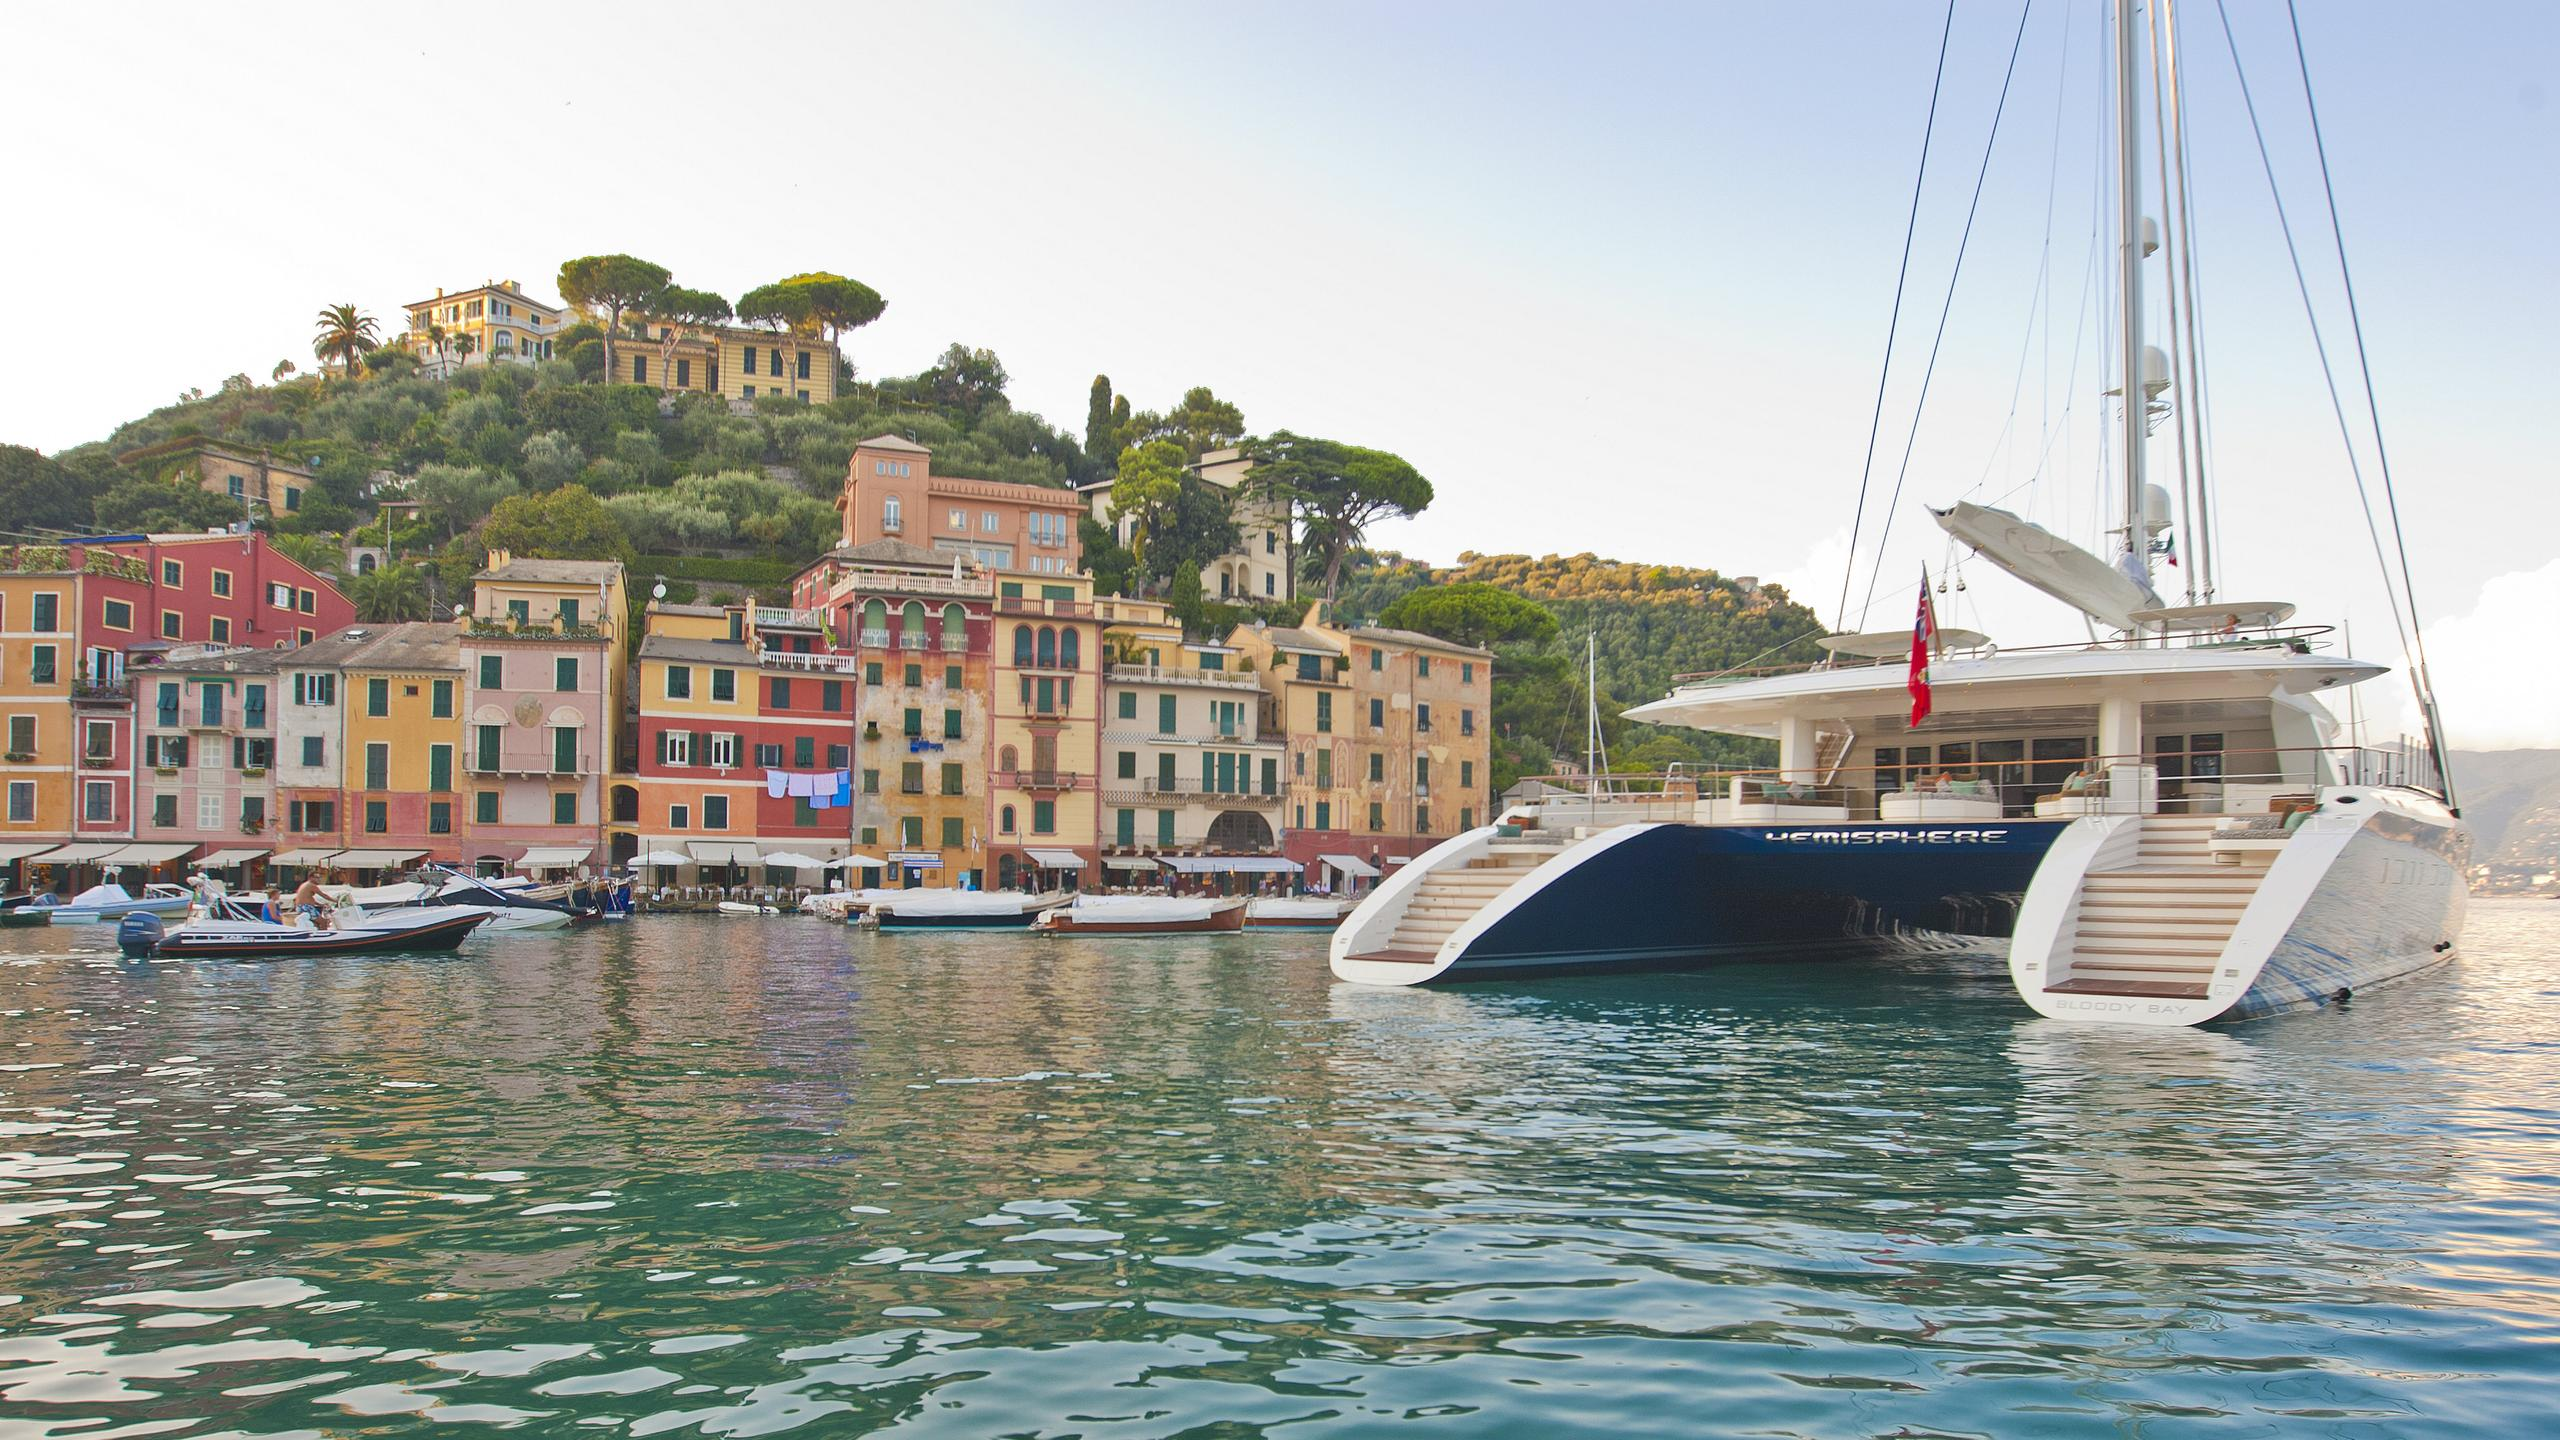 hemisphere-sailing-yacht-pendennis-2011-44m-berth-harbour